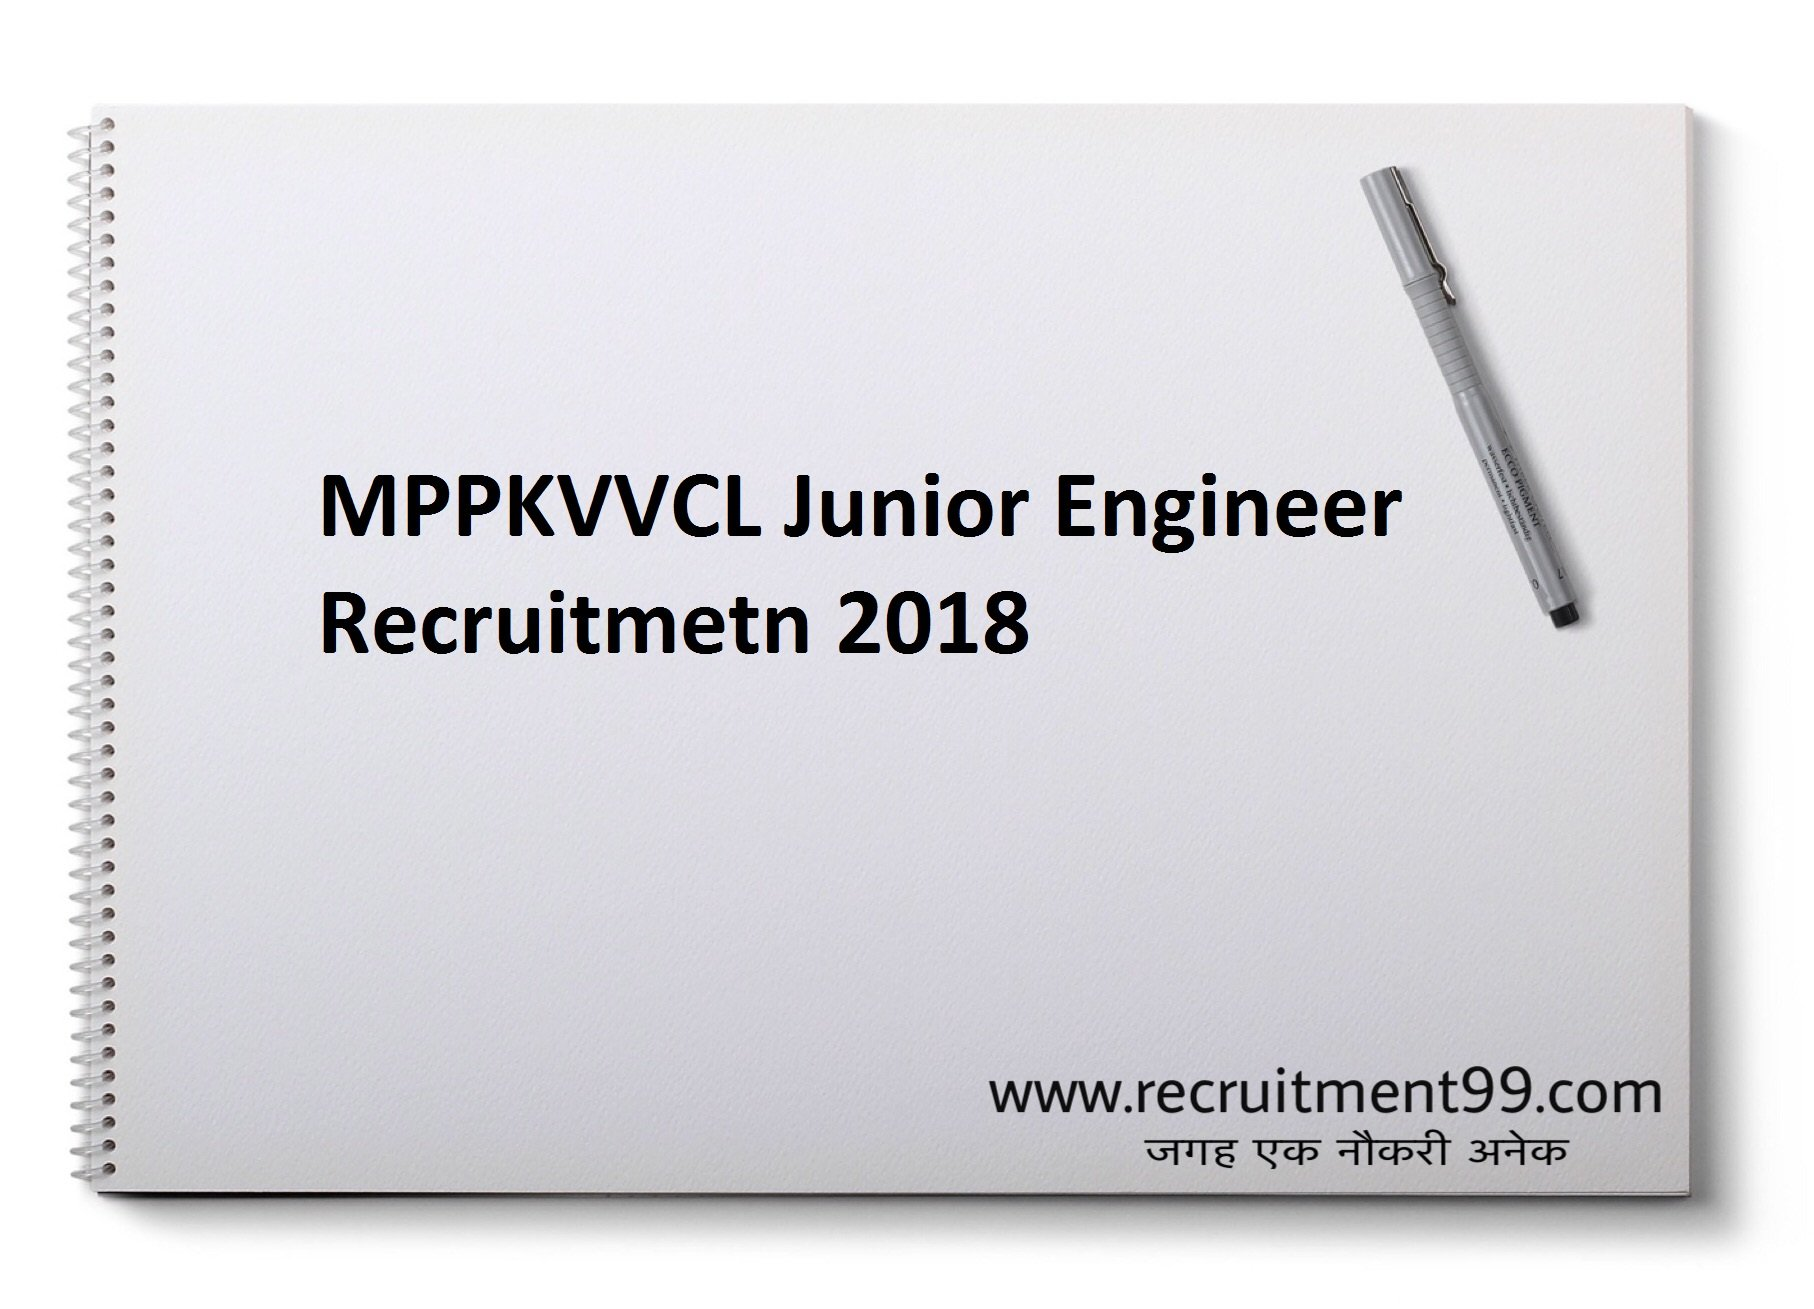 MPPKVVCL Junior Engineer Recruitment Admit Card Result 2018